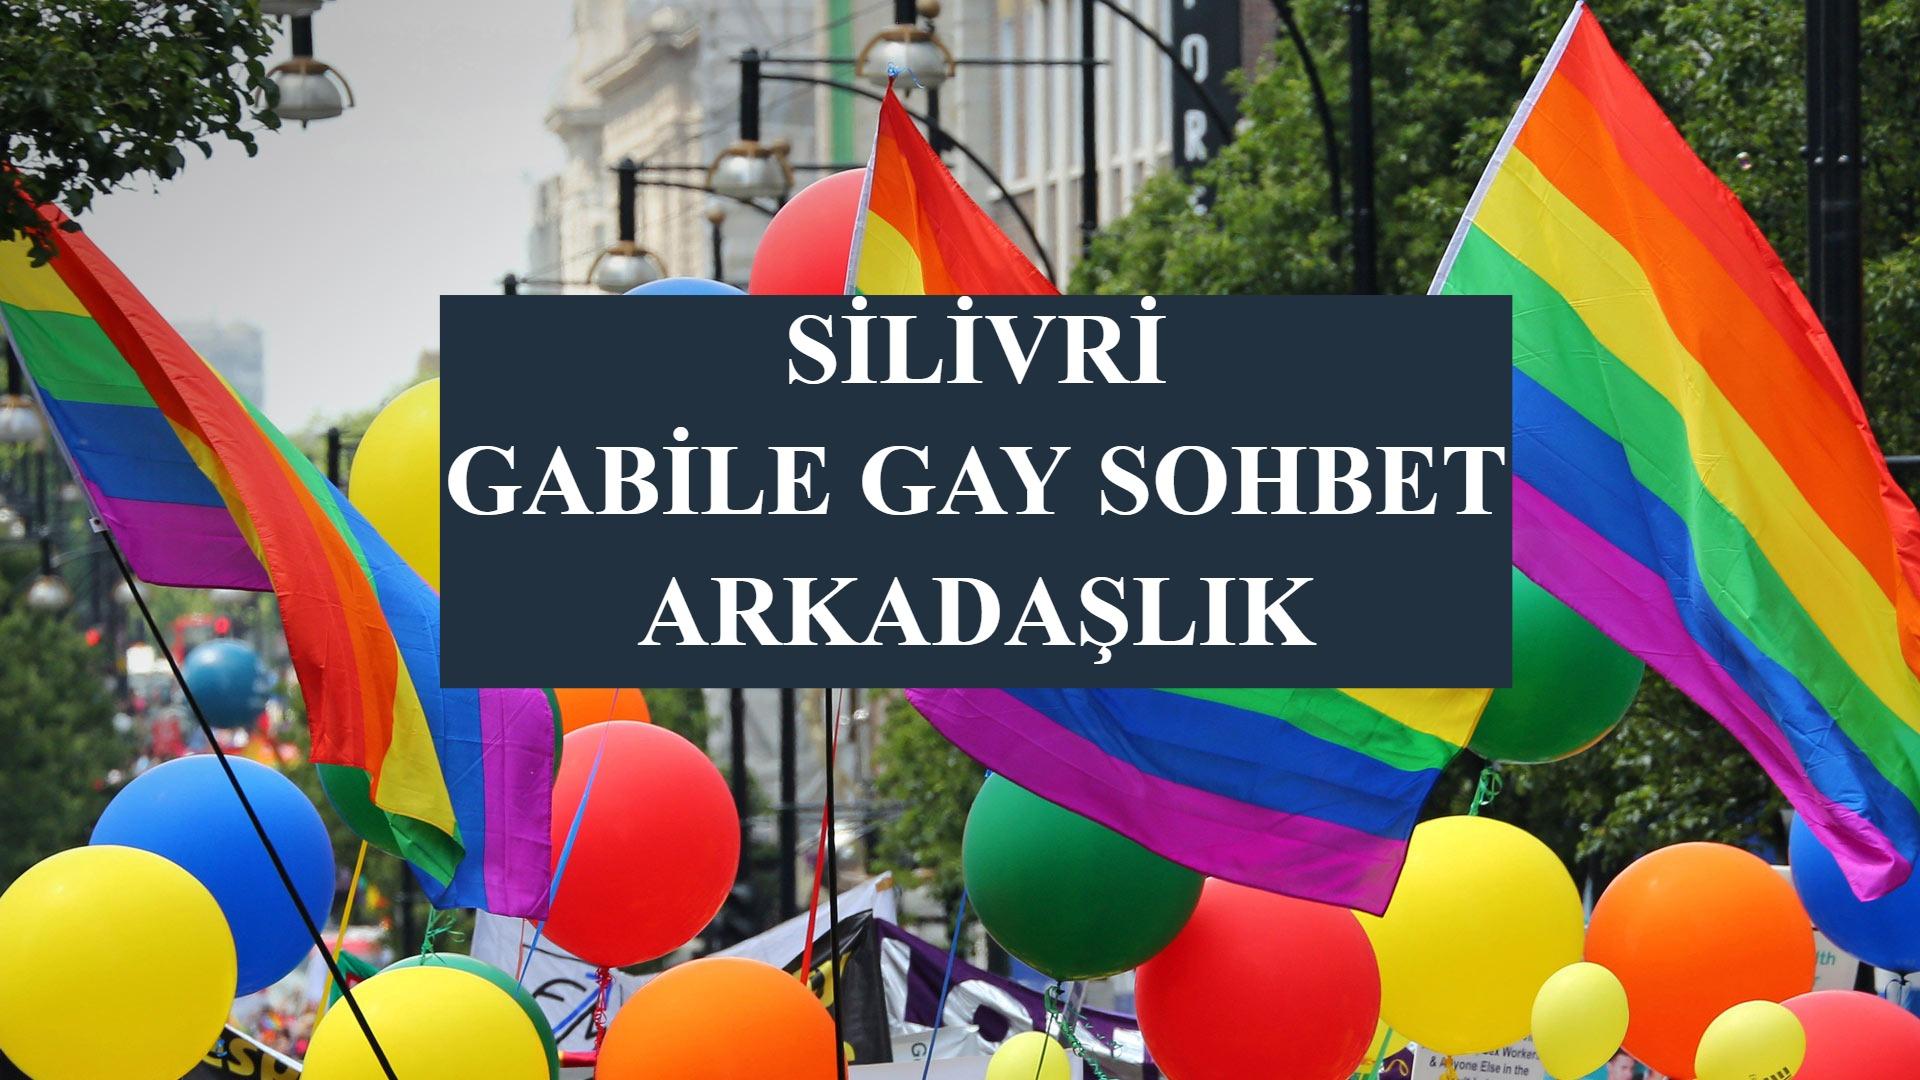 Silivri Gabile Gay Sohbet